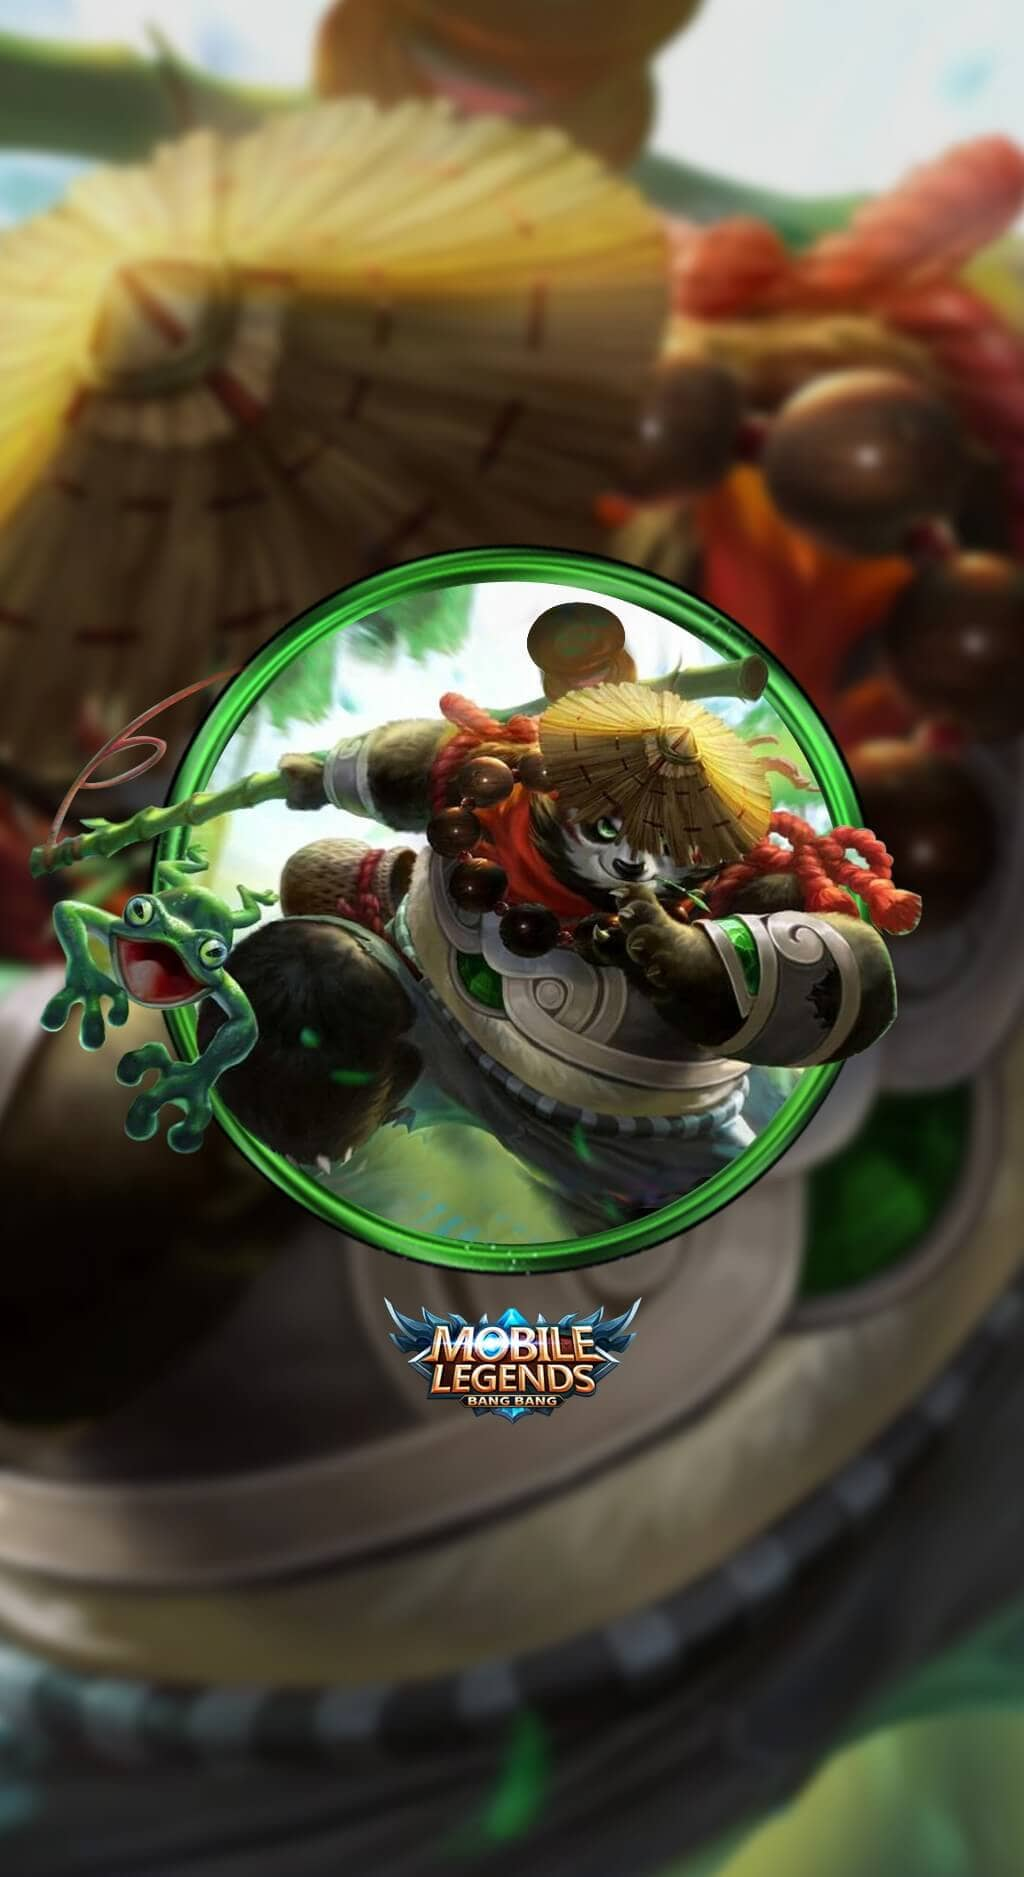 Akai Panda Warrior Wallpaper Mobile Legends HD for Mobile - Hobigame.id